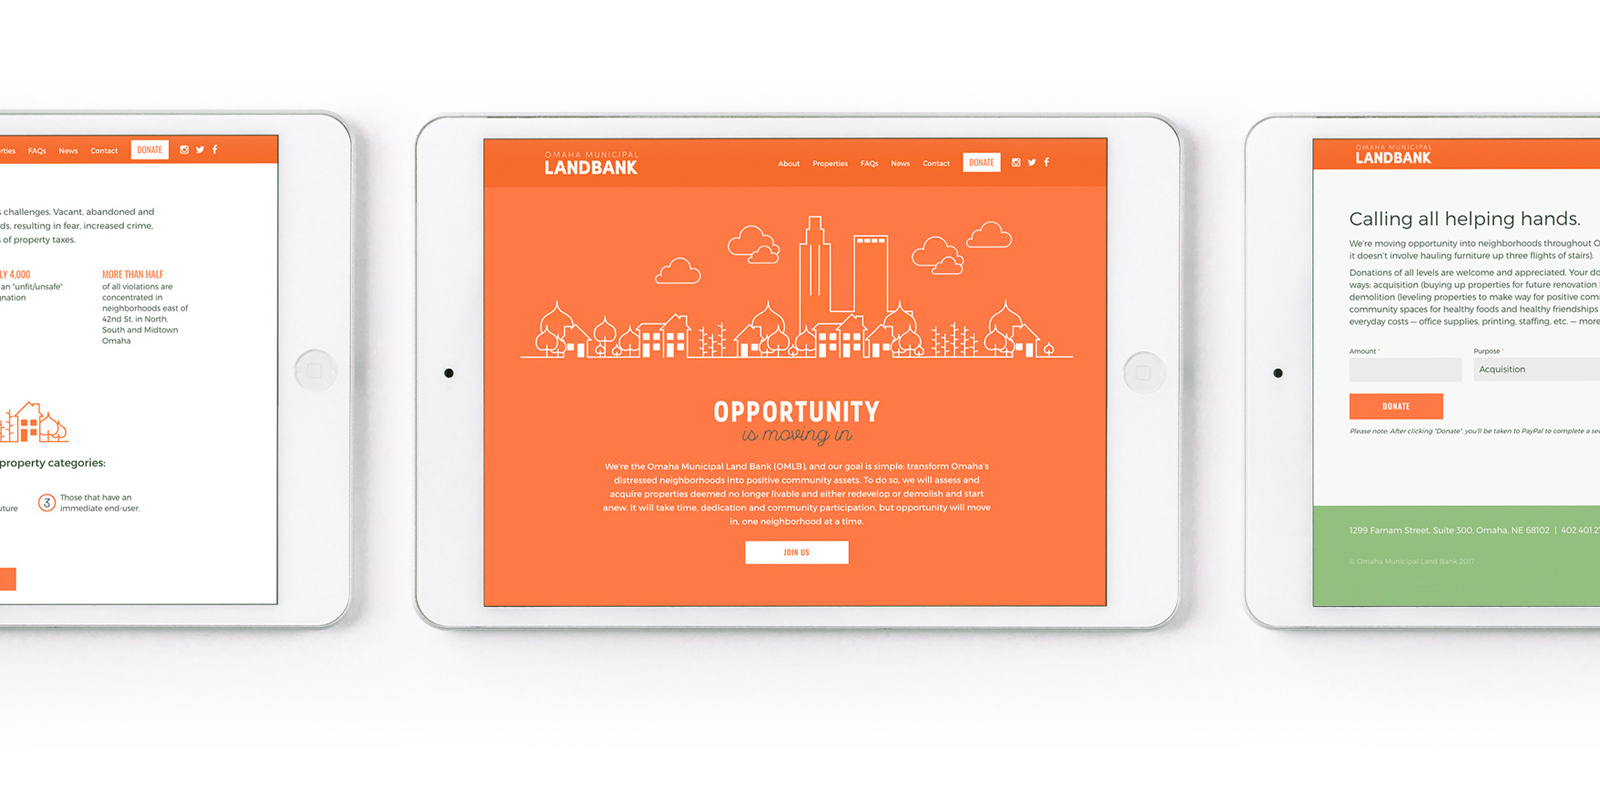 Omaha Land Bank website